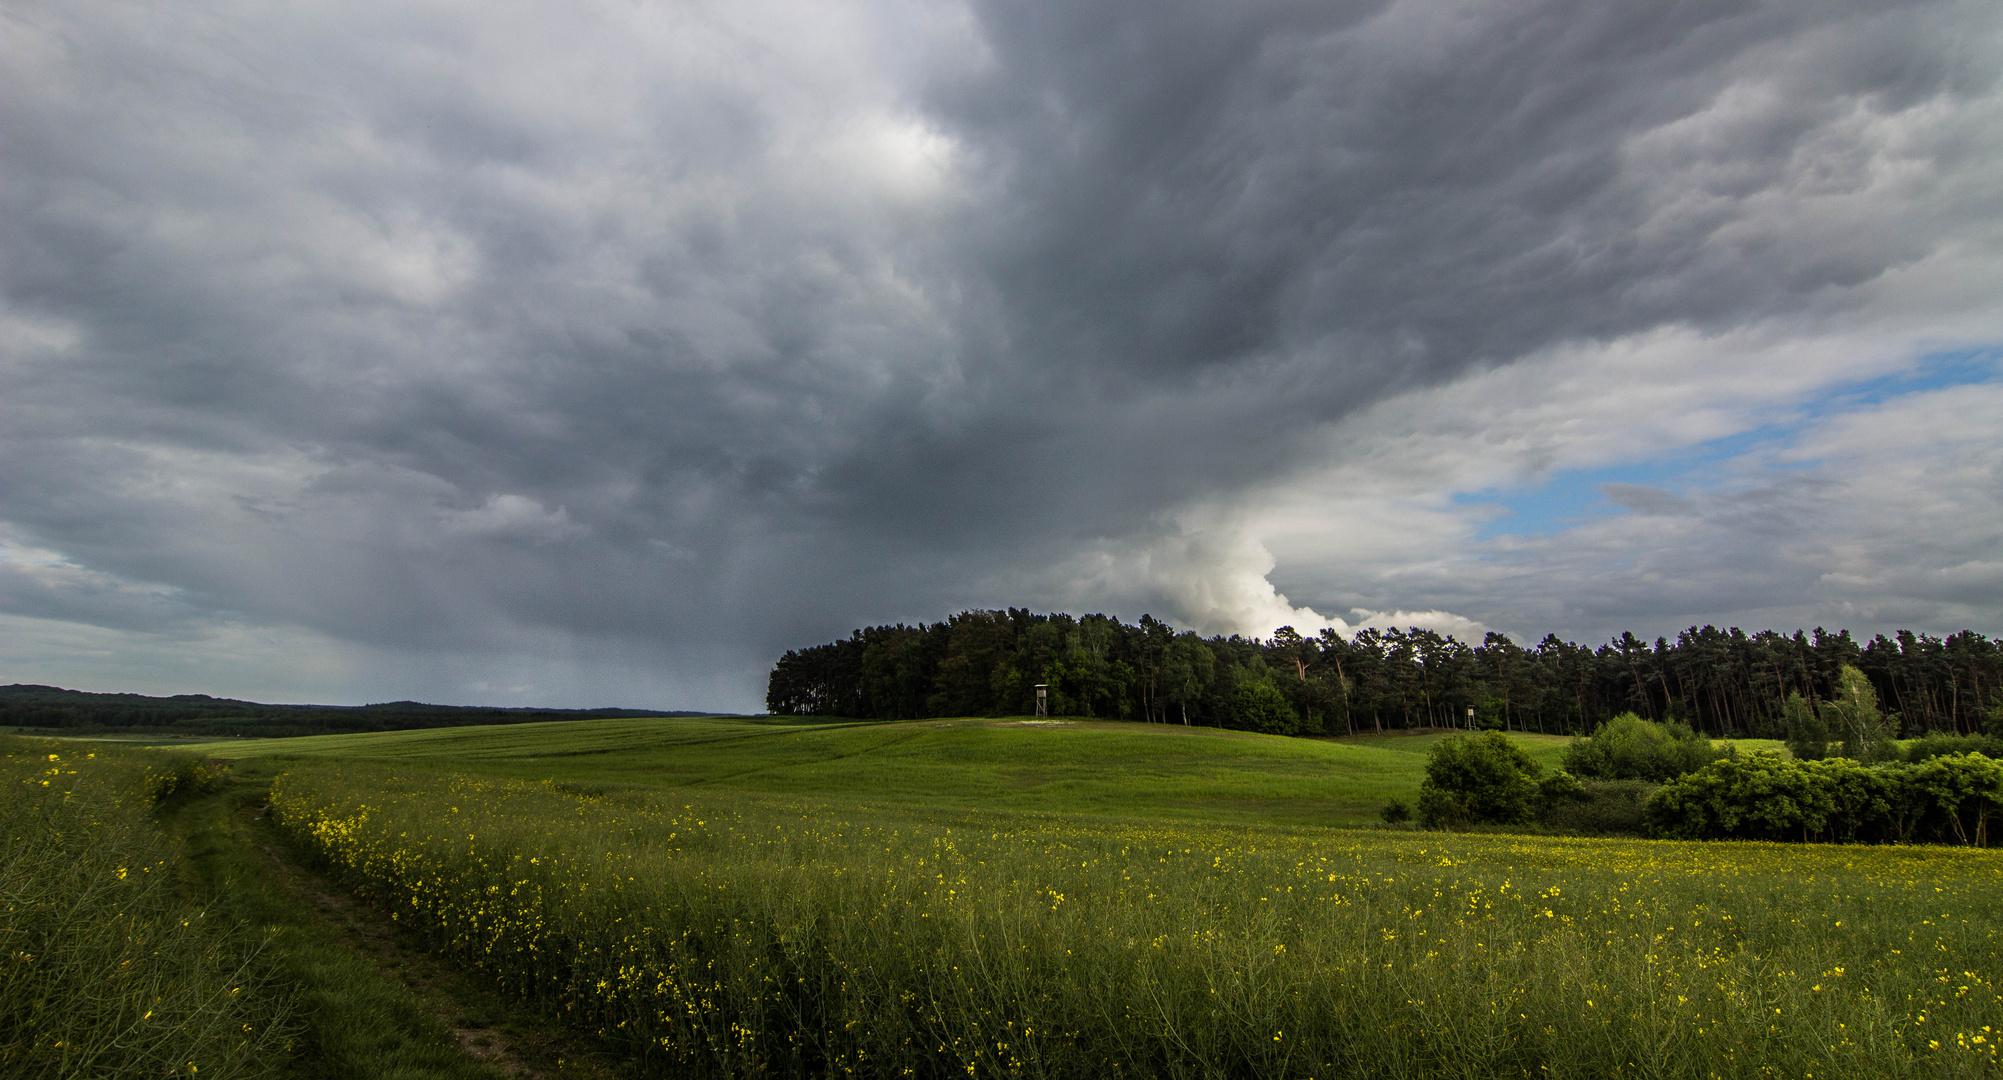 Wachse - Wetter